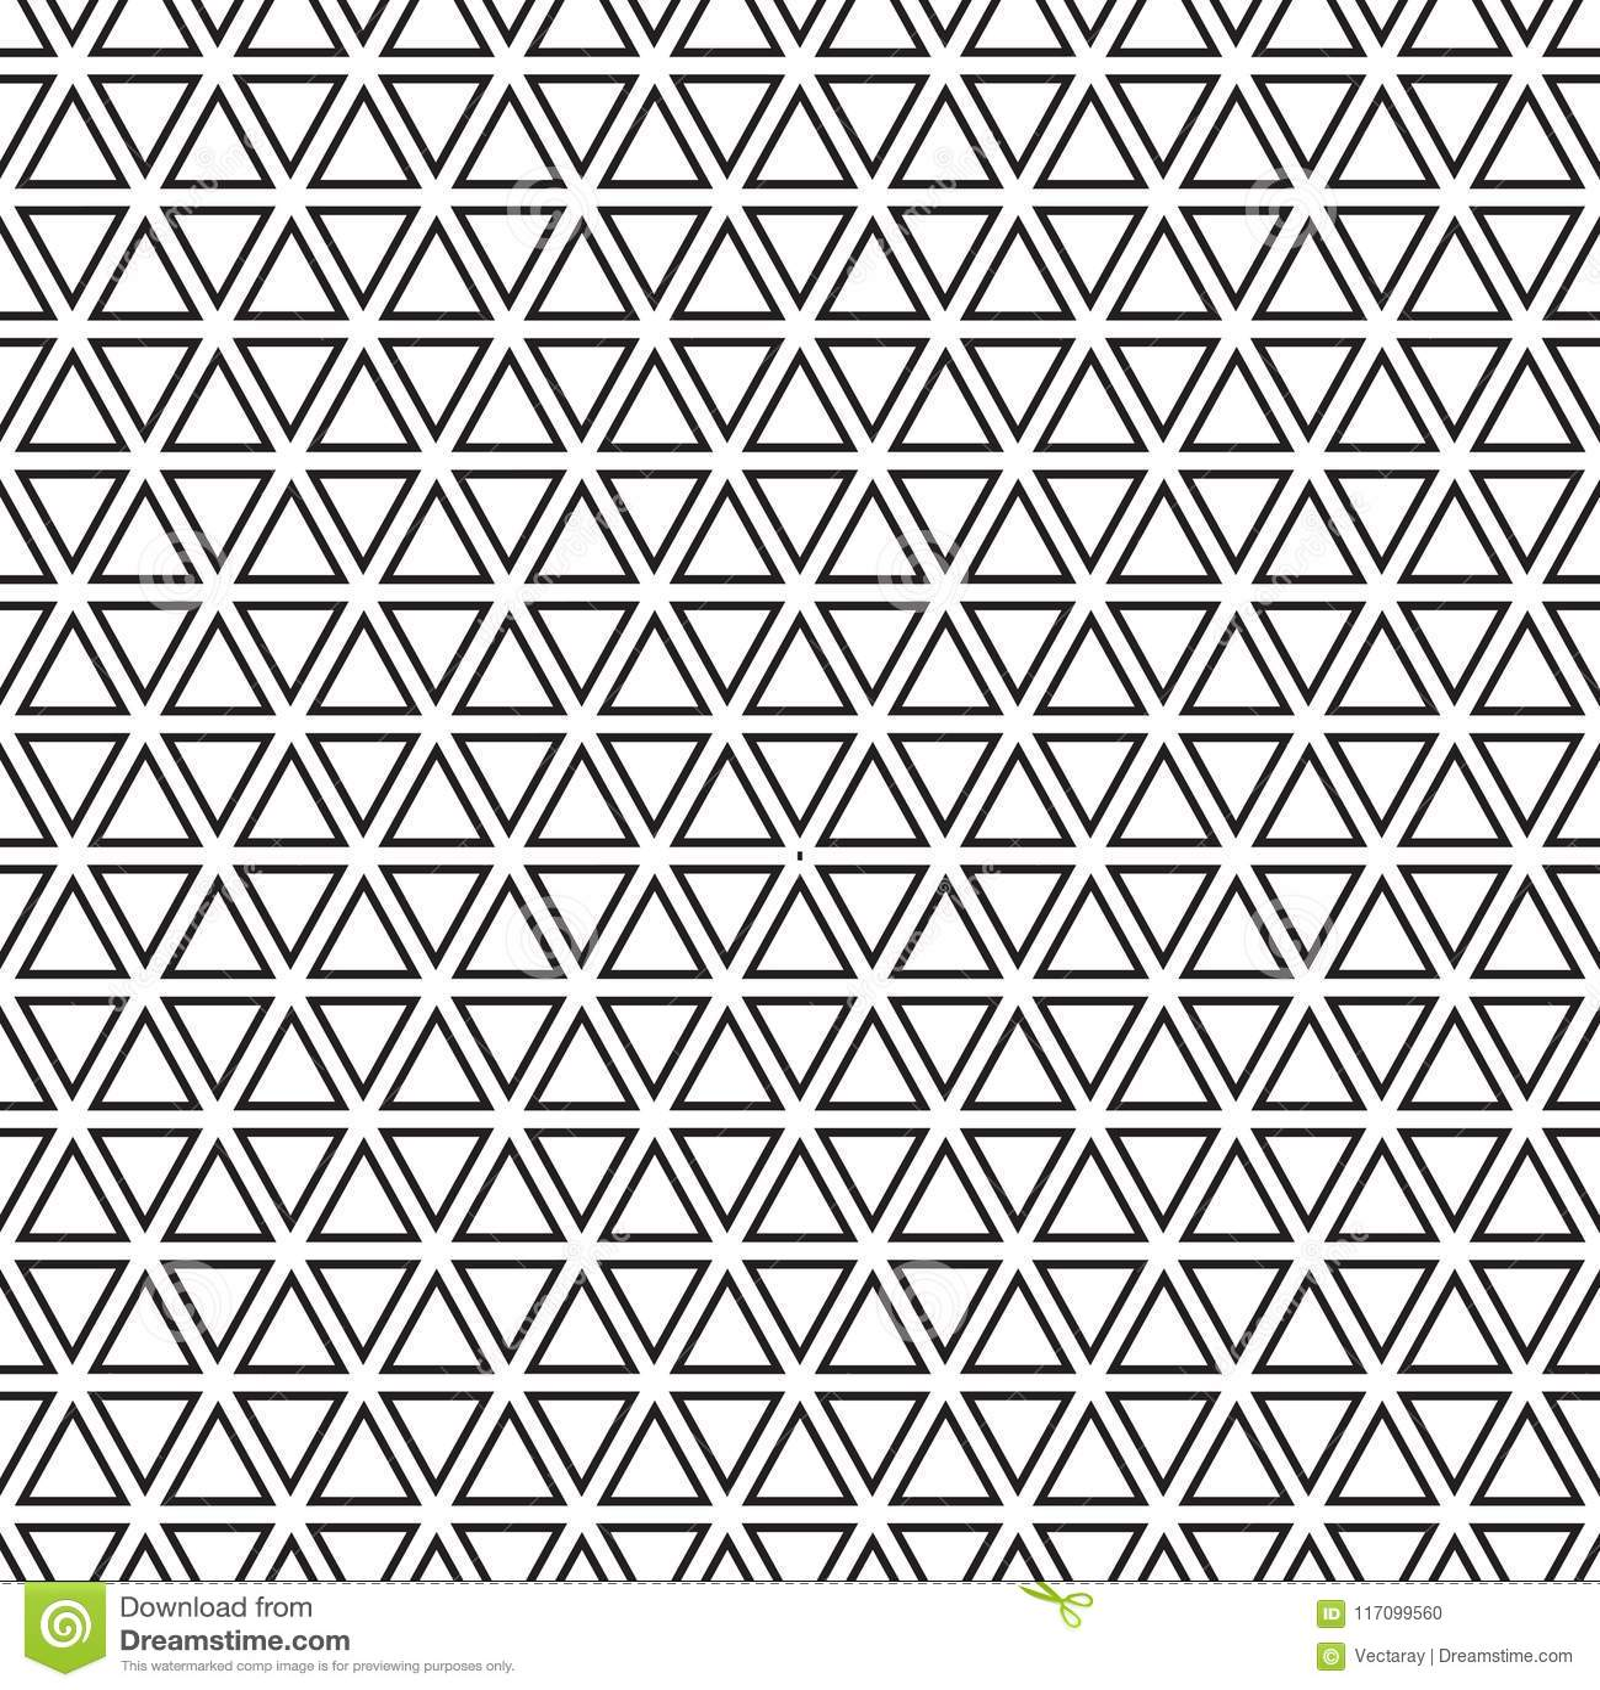 Seamless Geometric Triangle Pattern Background Stock Illustration